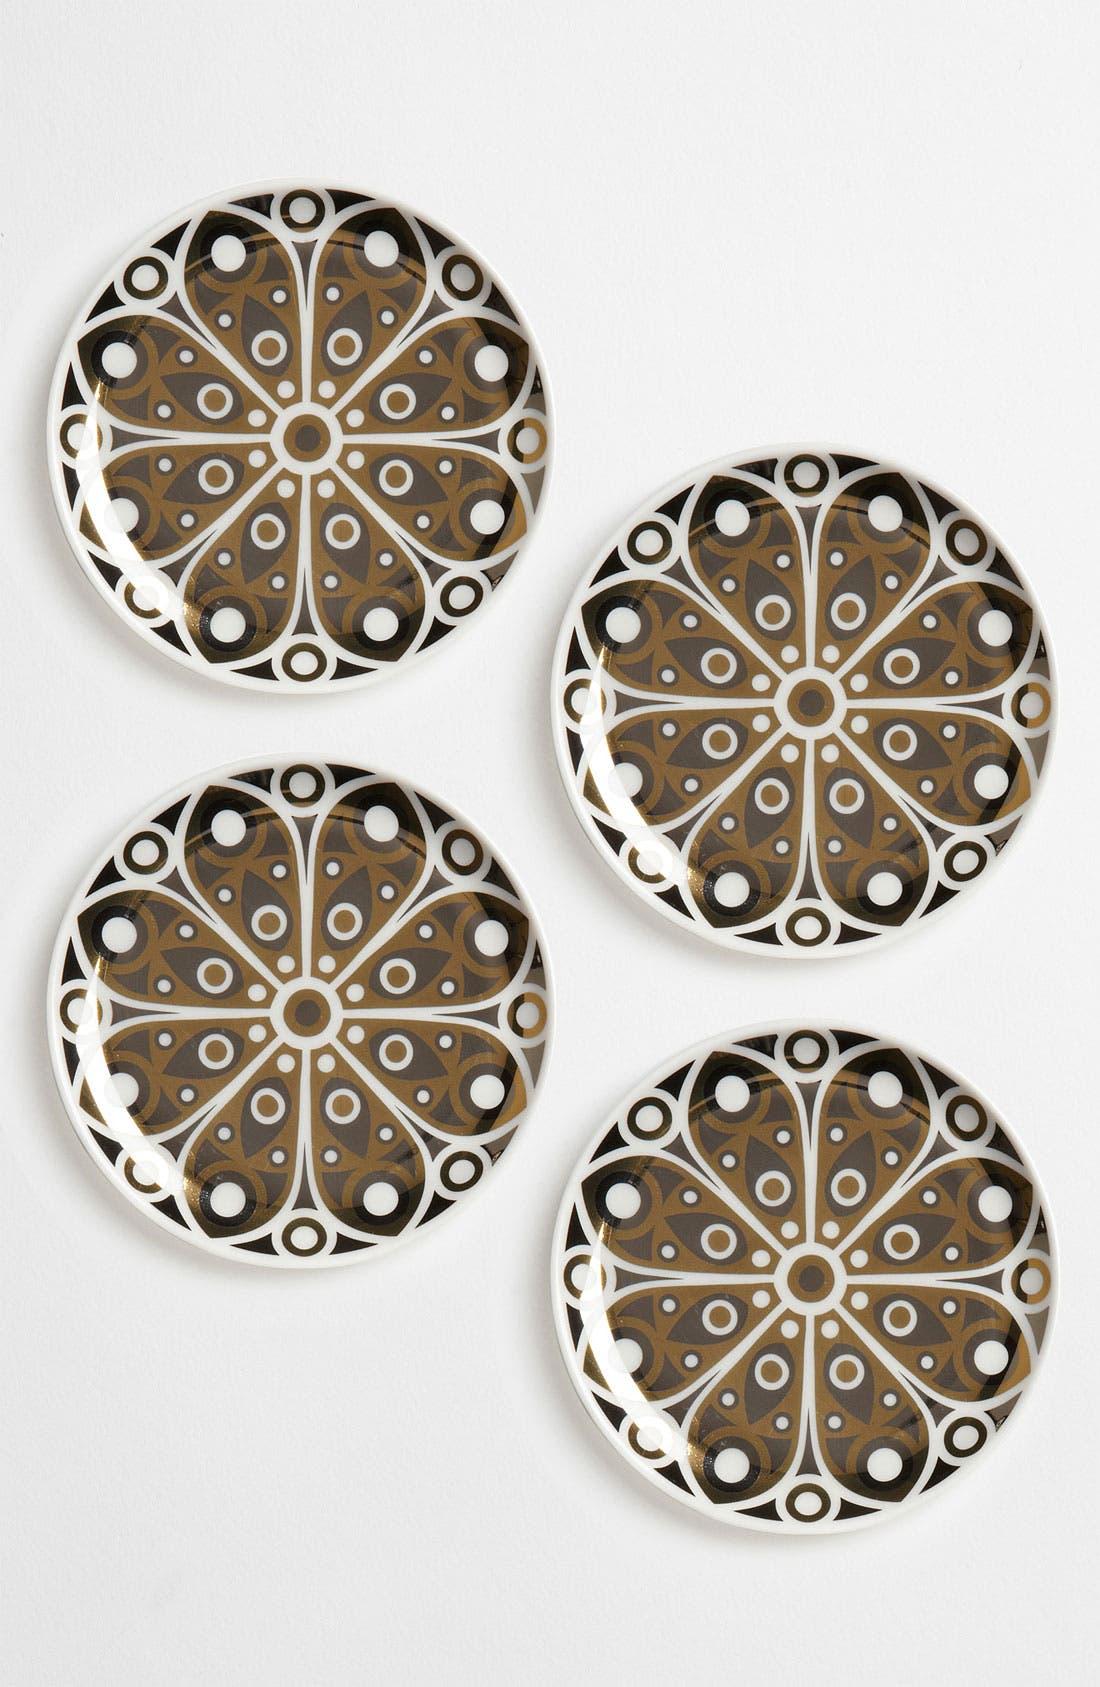 Alternate Image 1 Selected - Jonathan Adler 'Peacock' Porcelain Coasters (Set of 4)